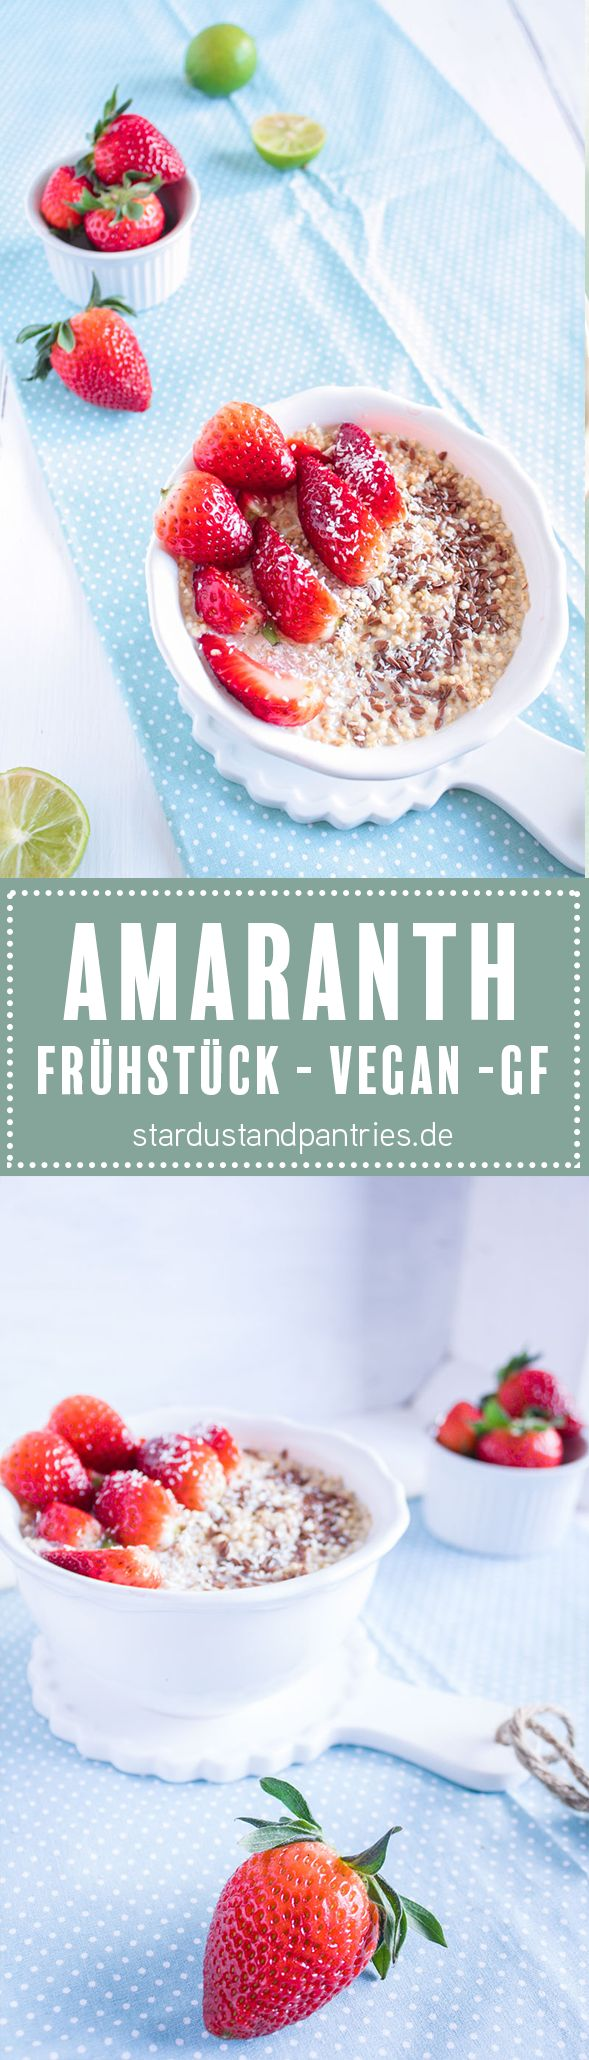 Veganes Frühstück I Amaranth. Entdeckt von Vegalife Rocks: www.vegaliferocks.de ✨ I Fleischlos glücklich, fit & Gesund✨ I Follow me for more vegan inspiration @vegaliferocks